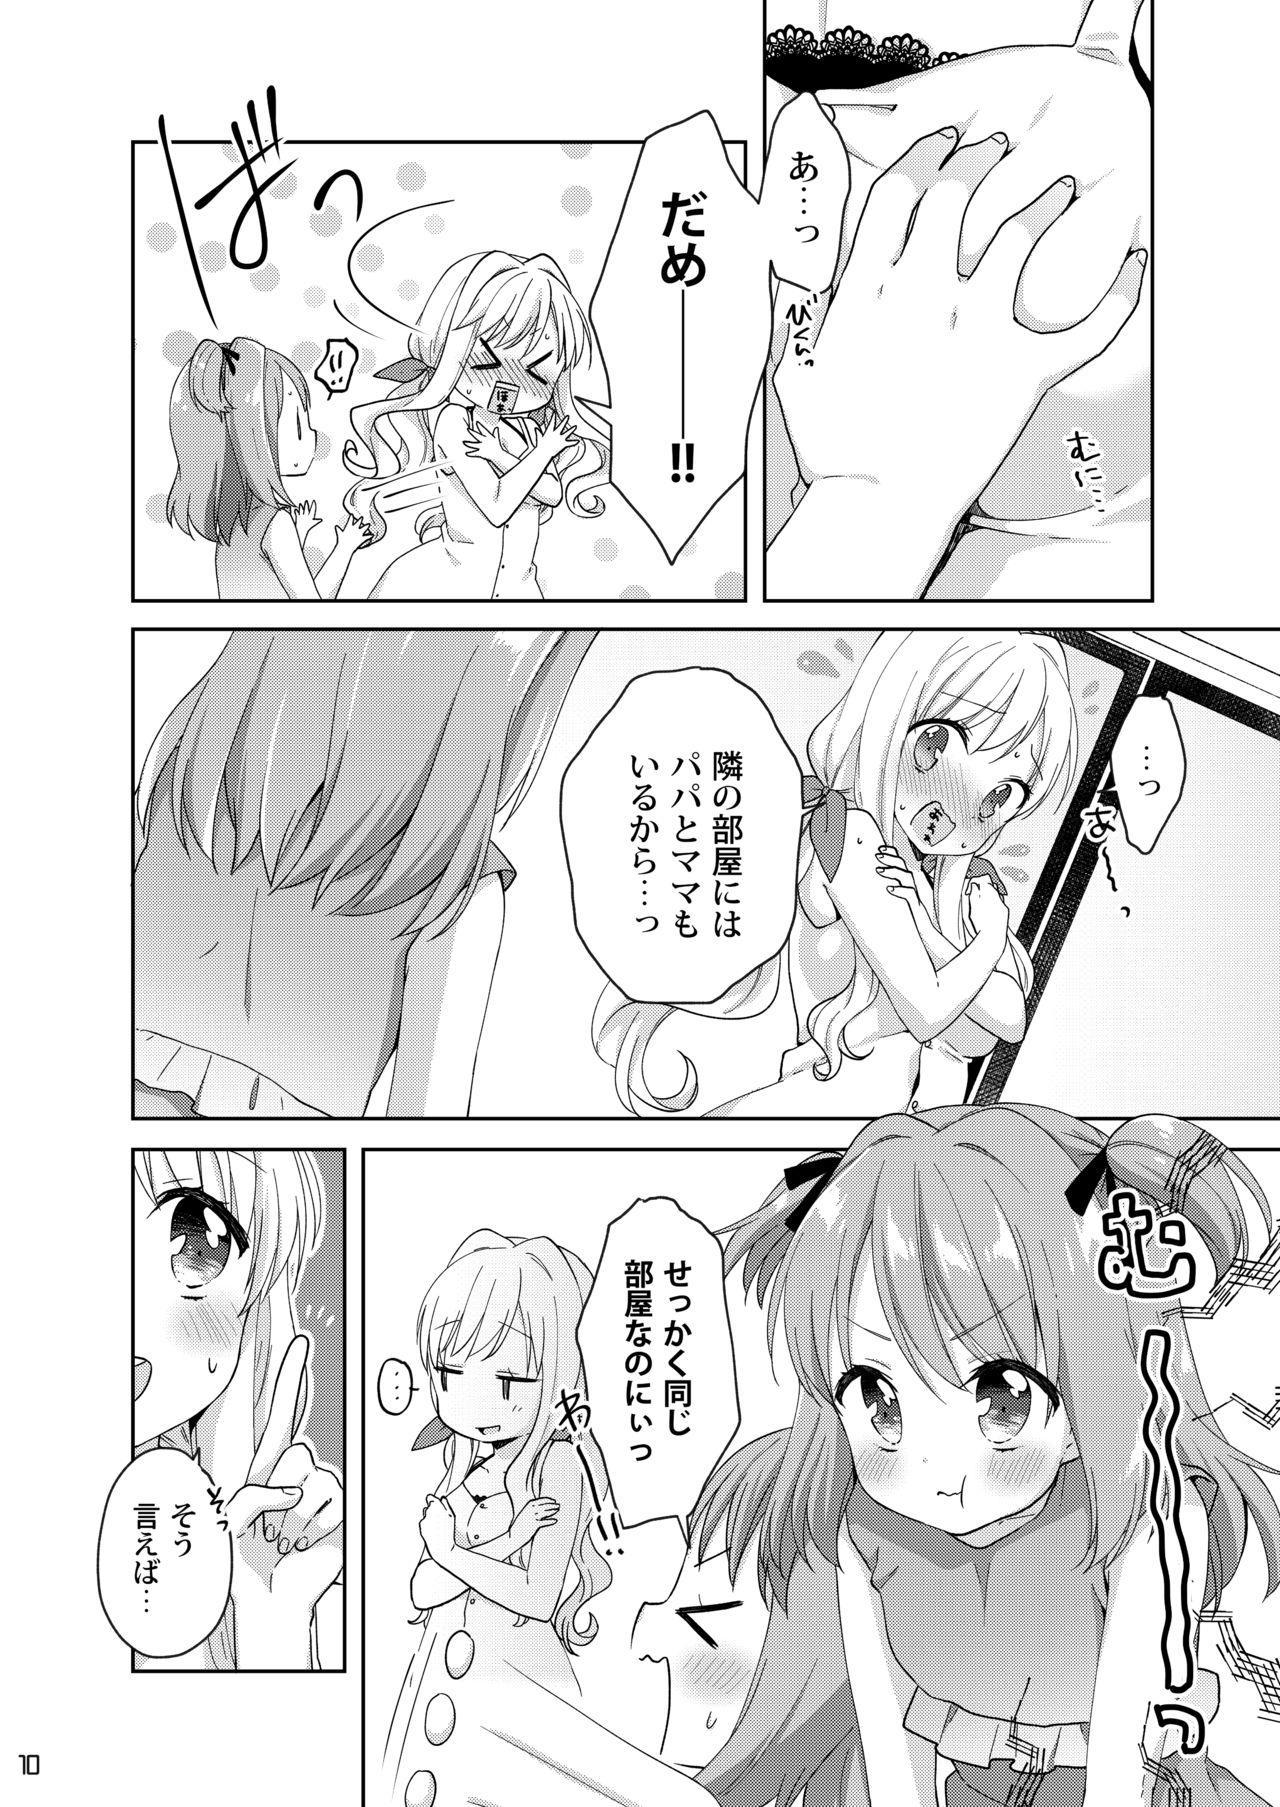 Kinyoubi no Otanoshimi 8